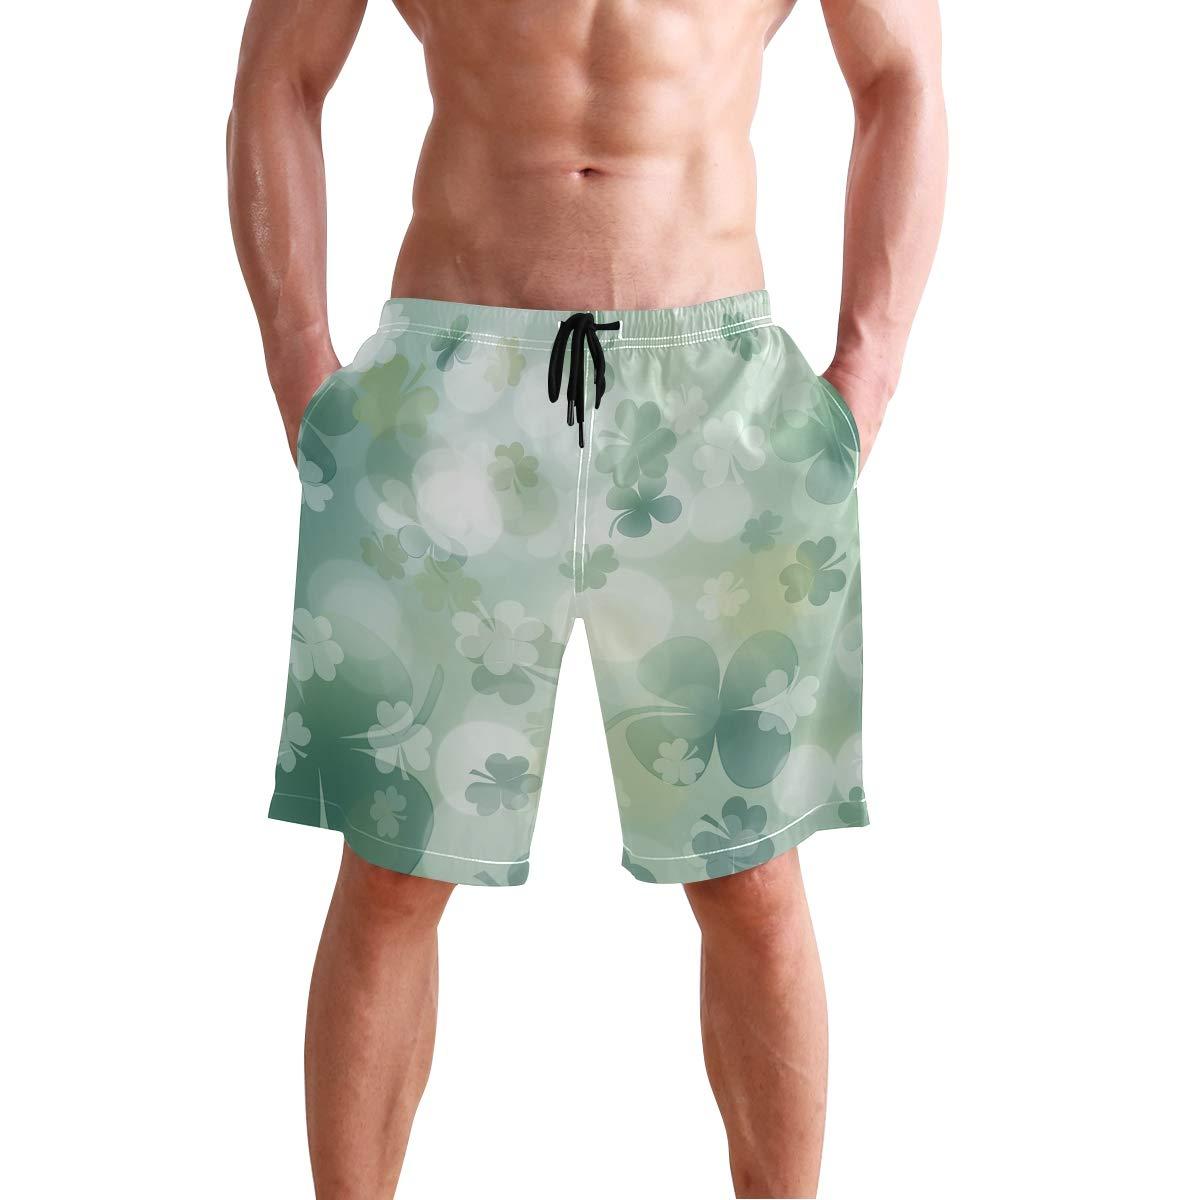 Patricks Day Mens Swim Trunks Quick Dry Beach Shorts with Mesh Lining